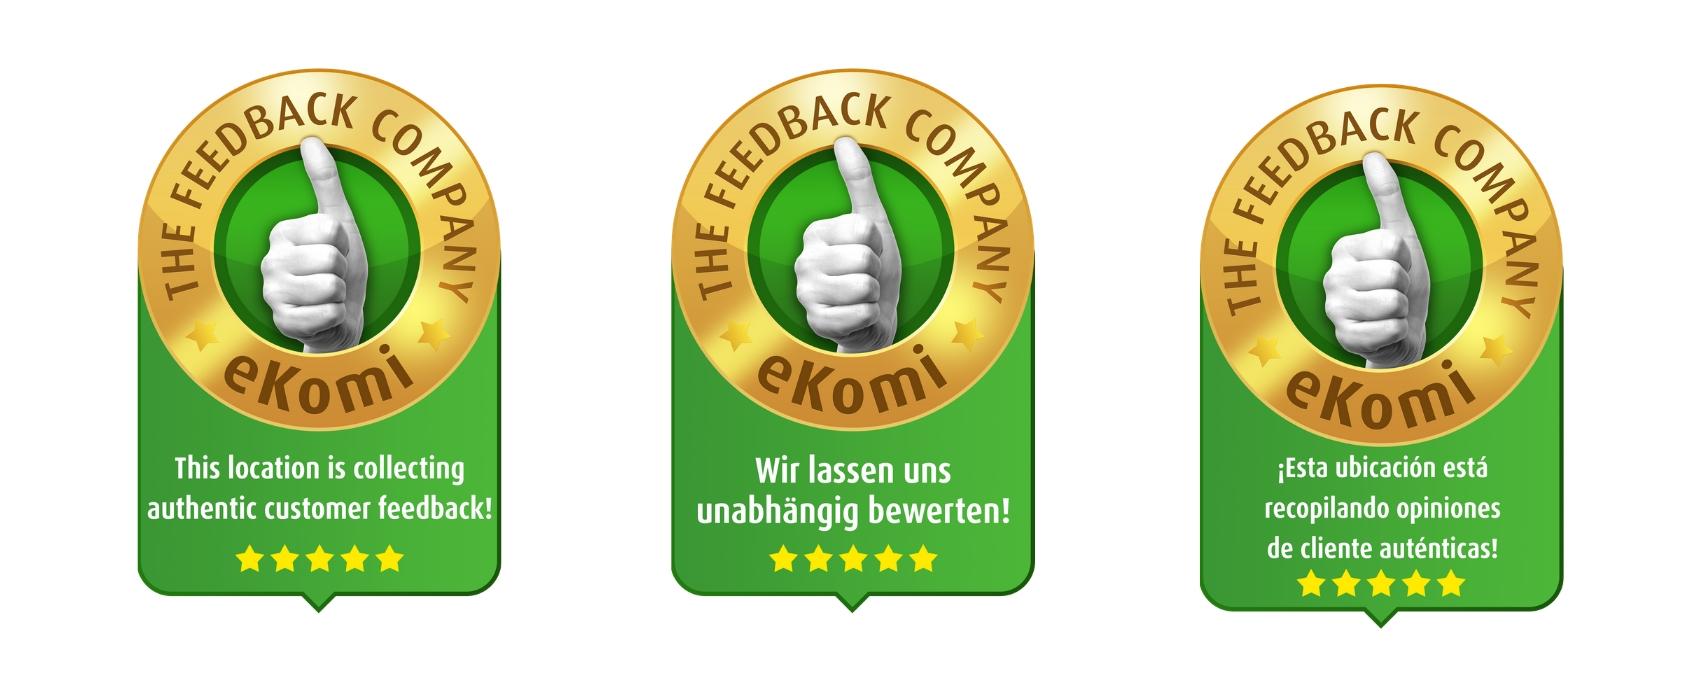 stickers_ekomi_appstore-1573479481.jpg